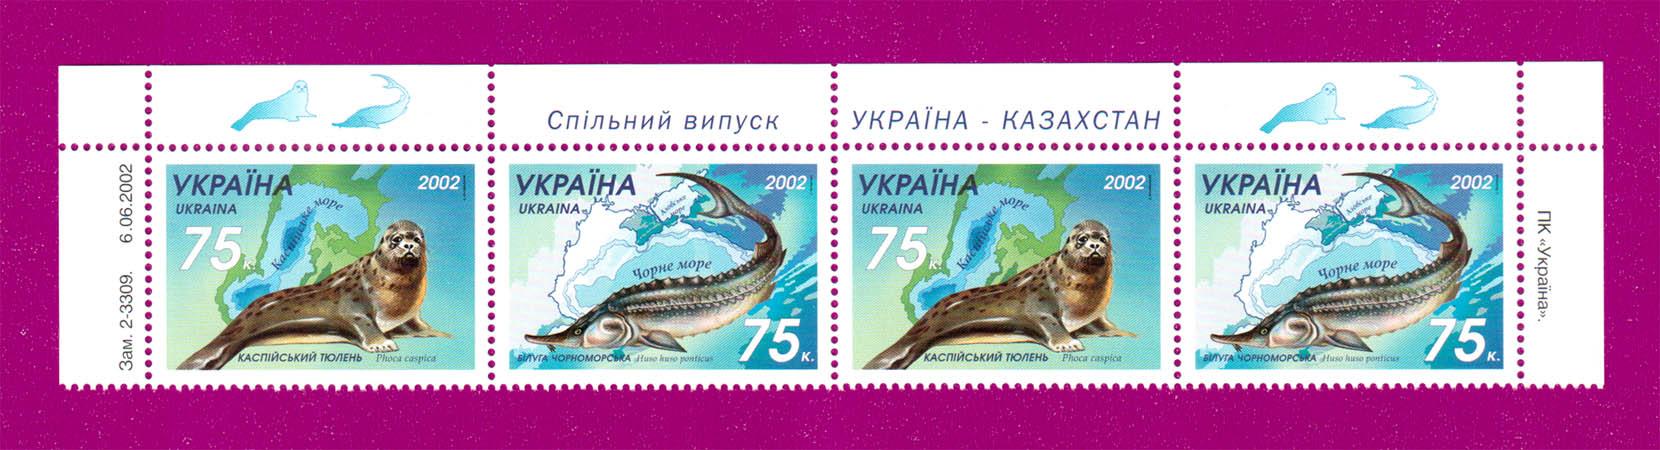 2002 верх листа Фауна Тюлень-белуга Украина